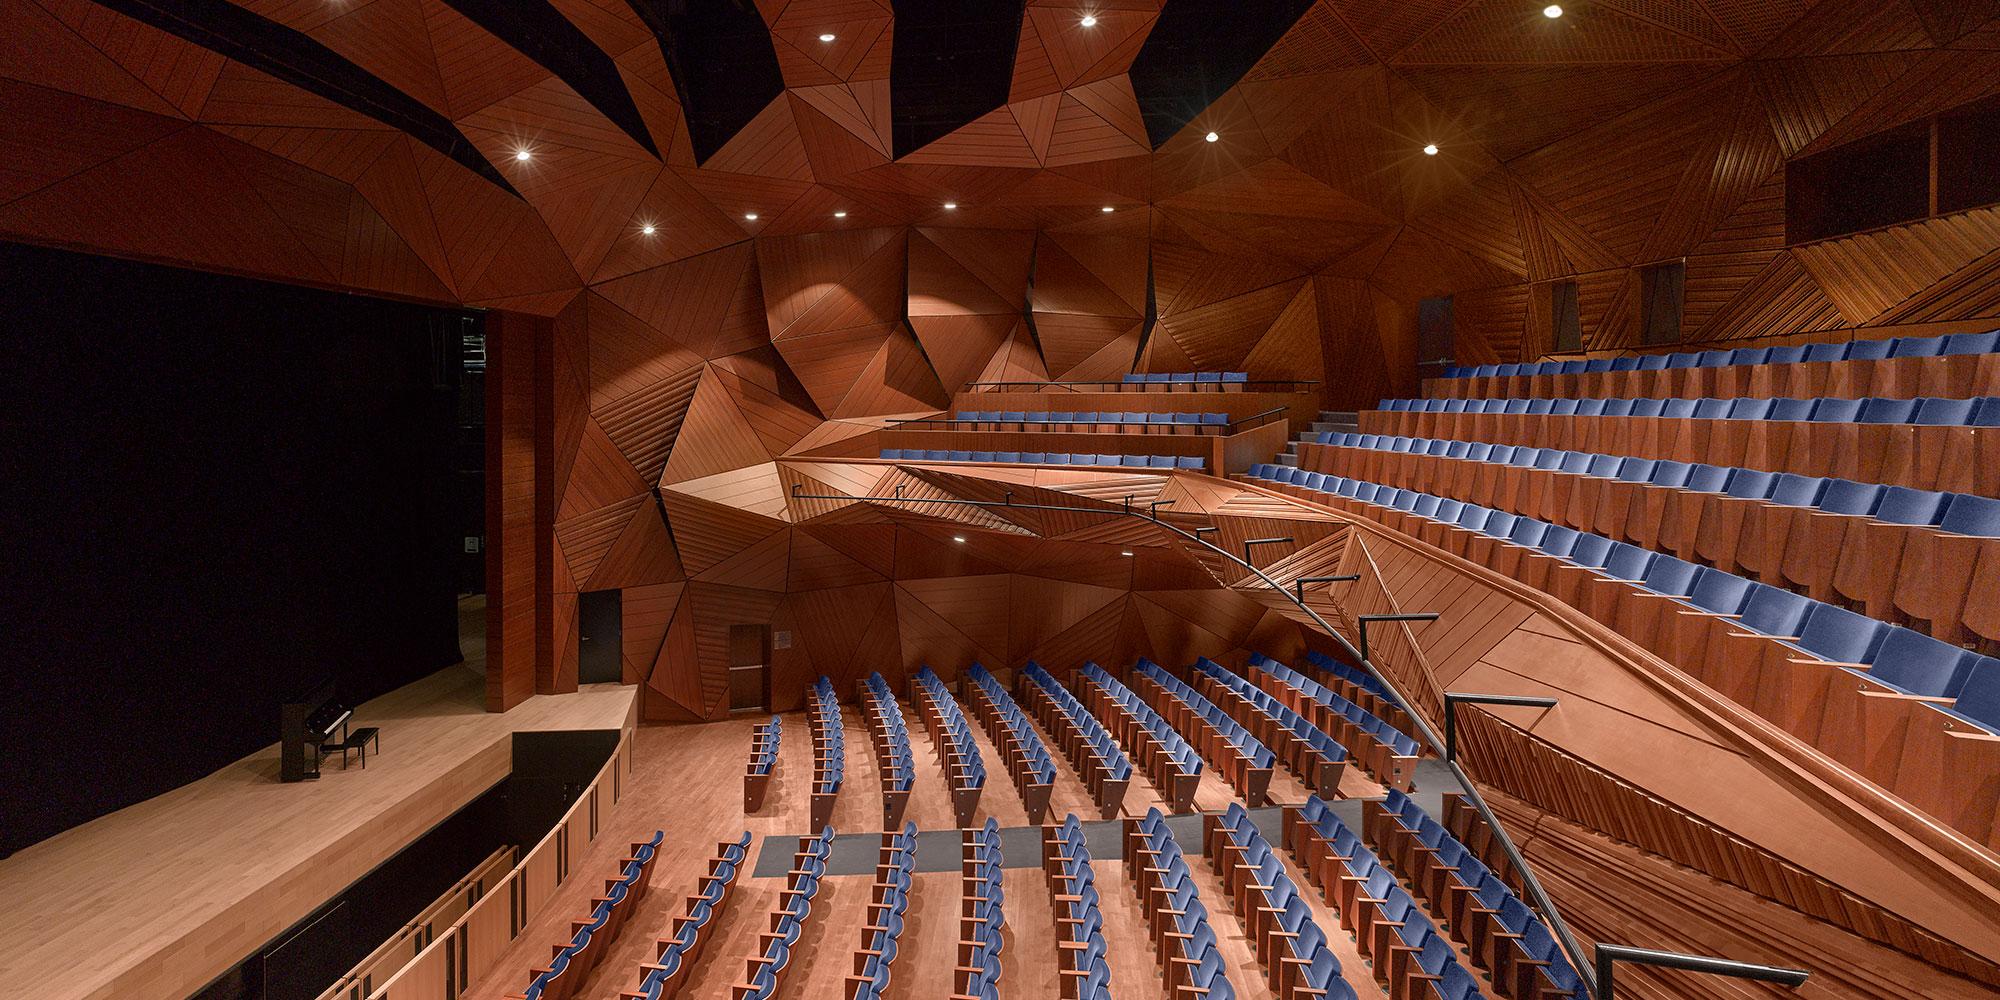 Rafael Viñoly Architects   New York University Abu Dhabi. Arts Center - Rafael Viñoly Architects